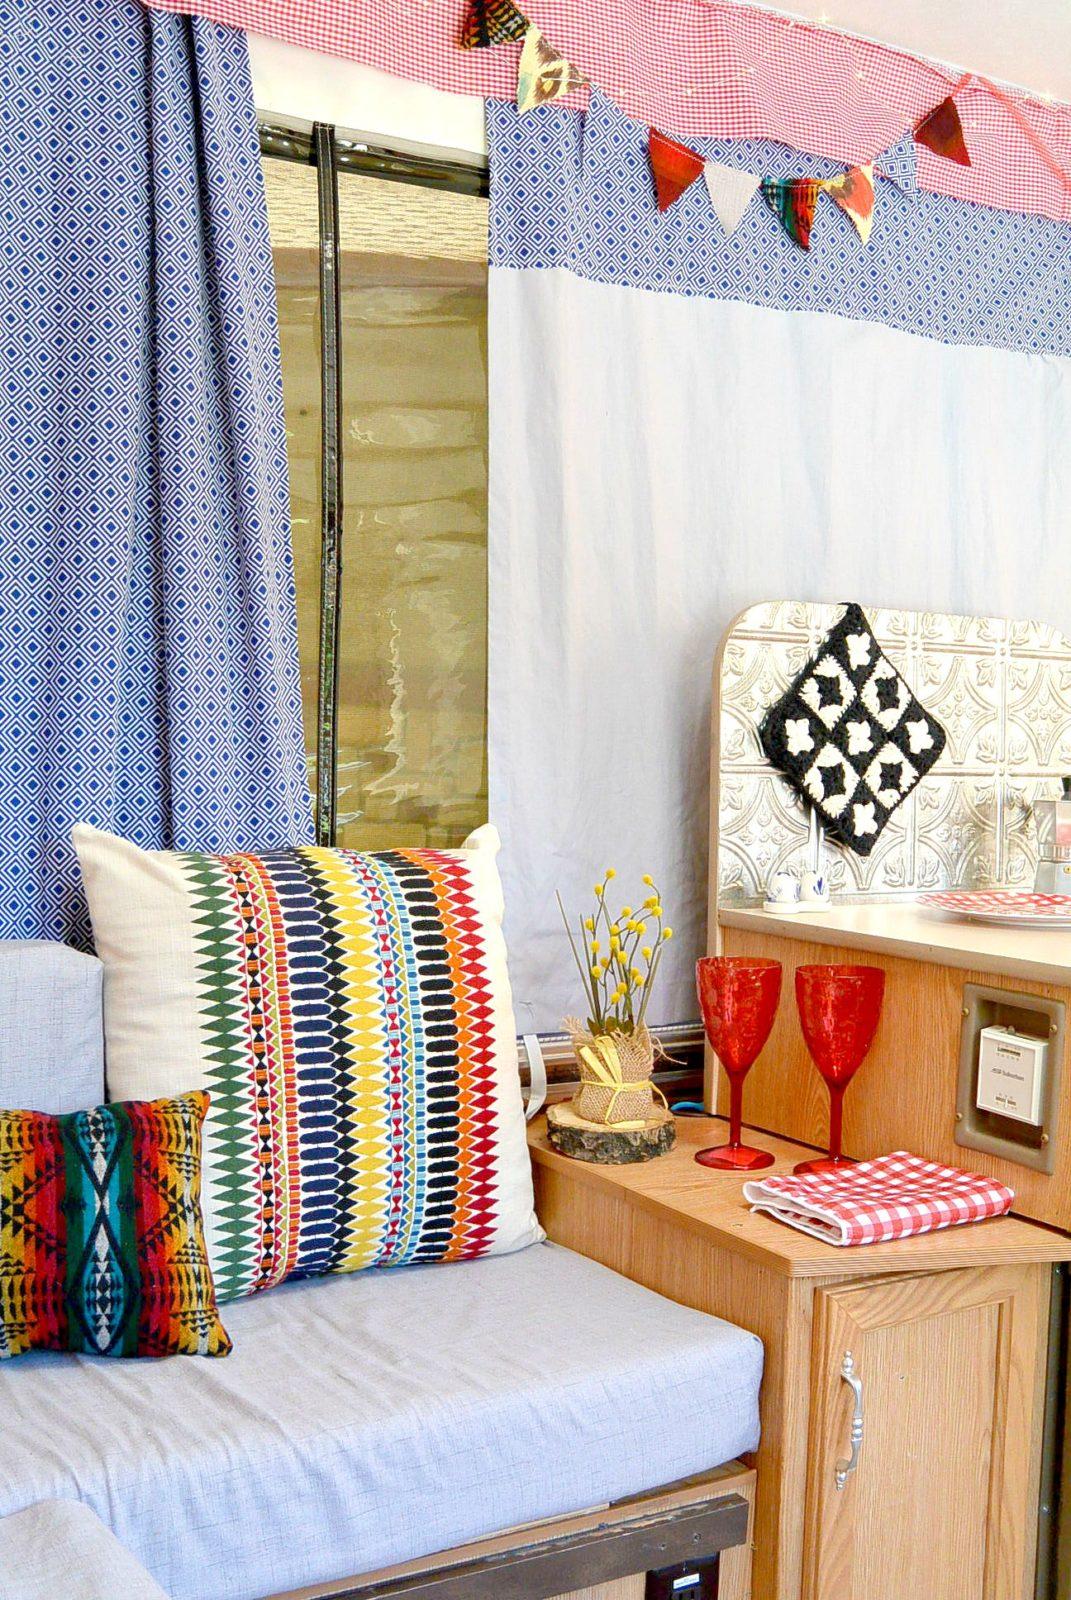 Yarn Break – Camper Remodel (Sewing, sewing, crochet, oh my!)